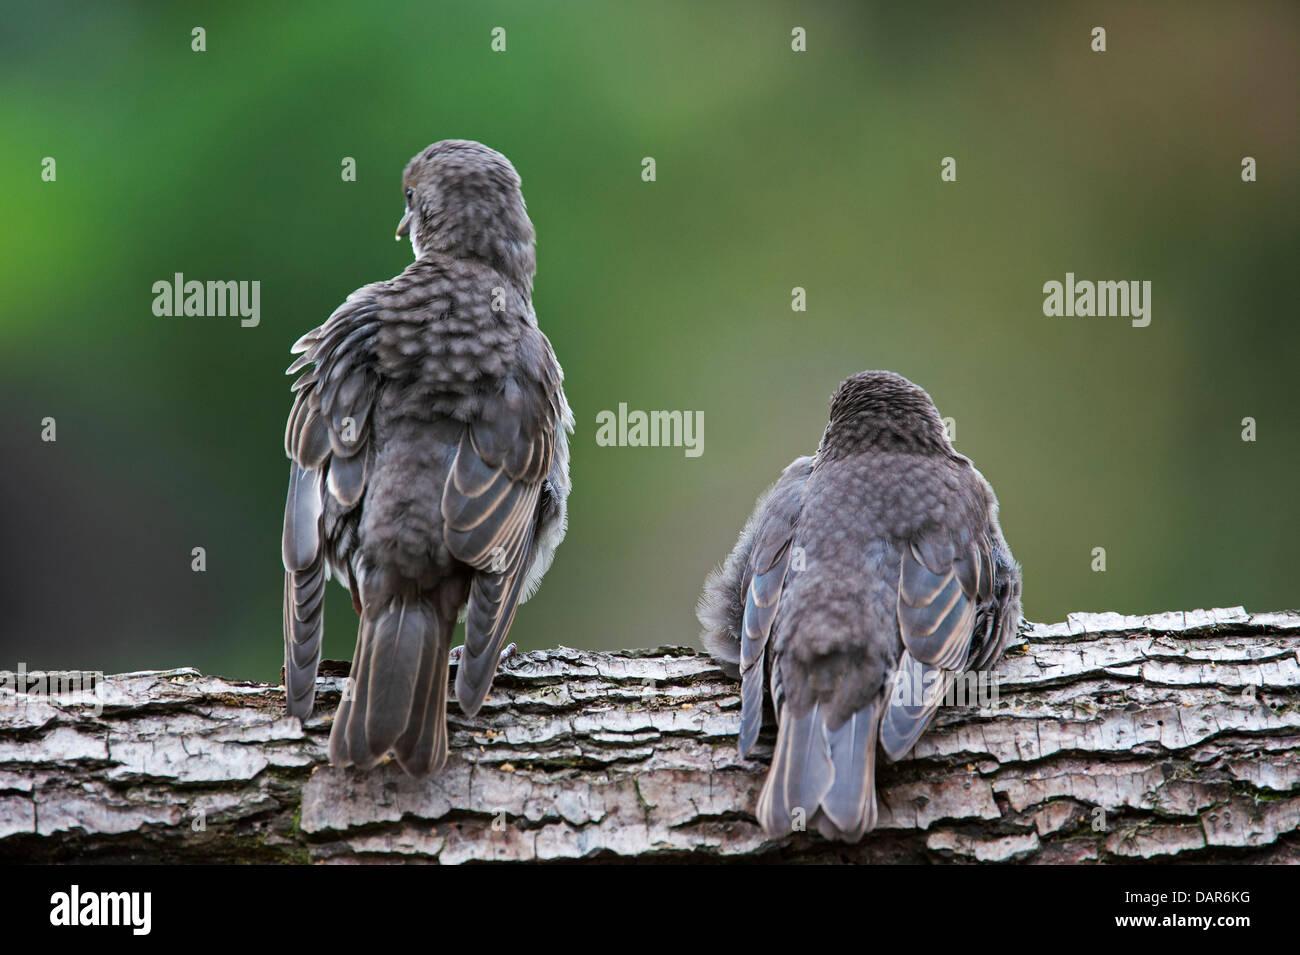 Two Common Starling / European starling (Sturnus vulgaris) fledglings begging for food in spring - Stock Image